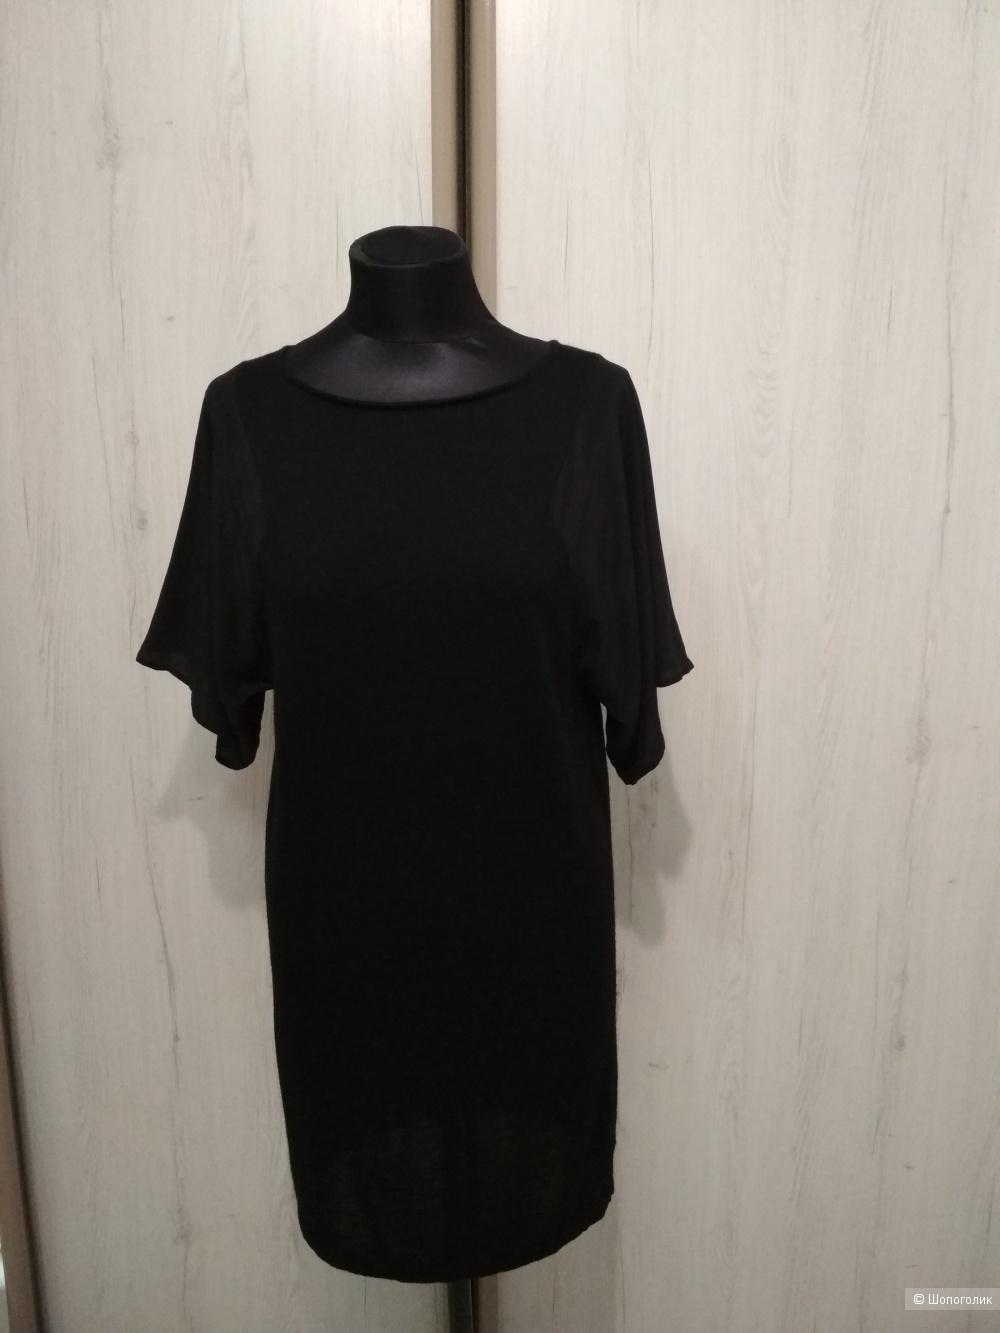 Шерстяное платье Stefnel, р. 44-46.